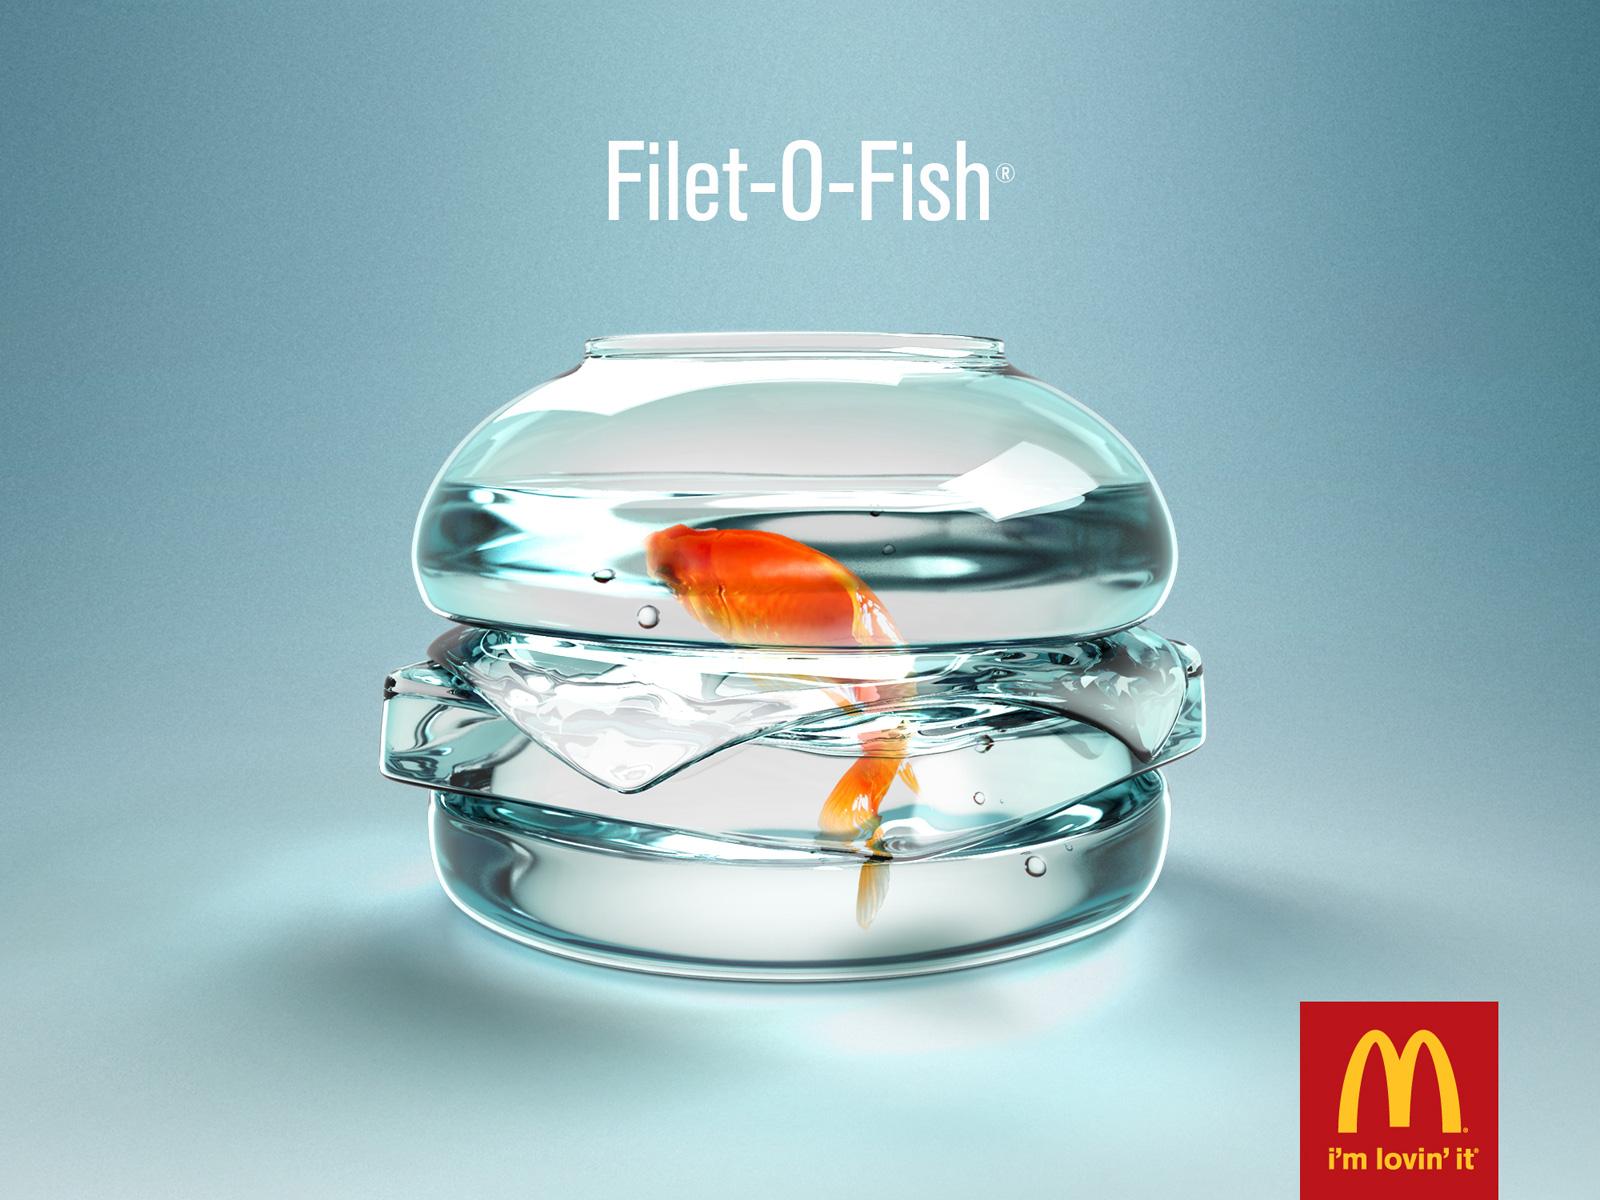 print ad leo burnett. McDonald\u0026#039;s Print Ad - Fish Bowl Leo Burnett